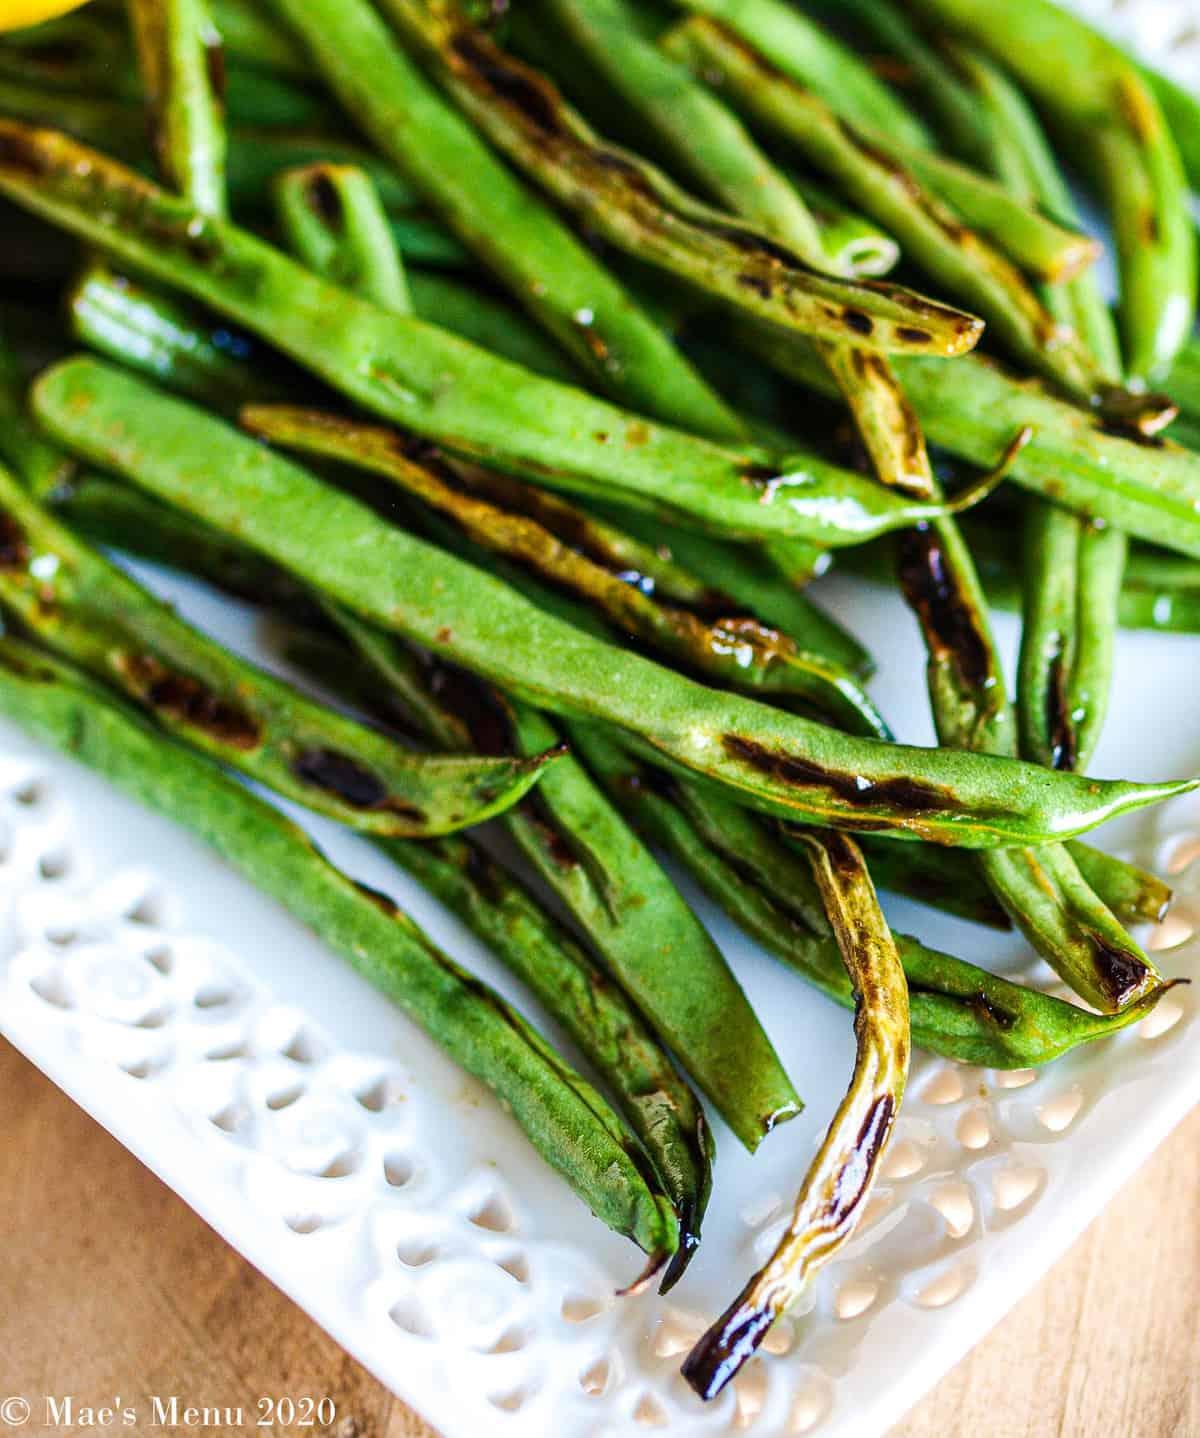 An up-close shot of blistered green beans